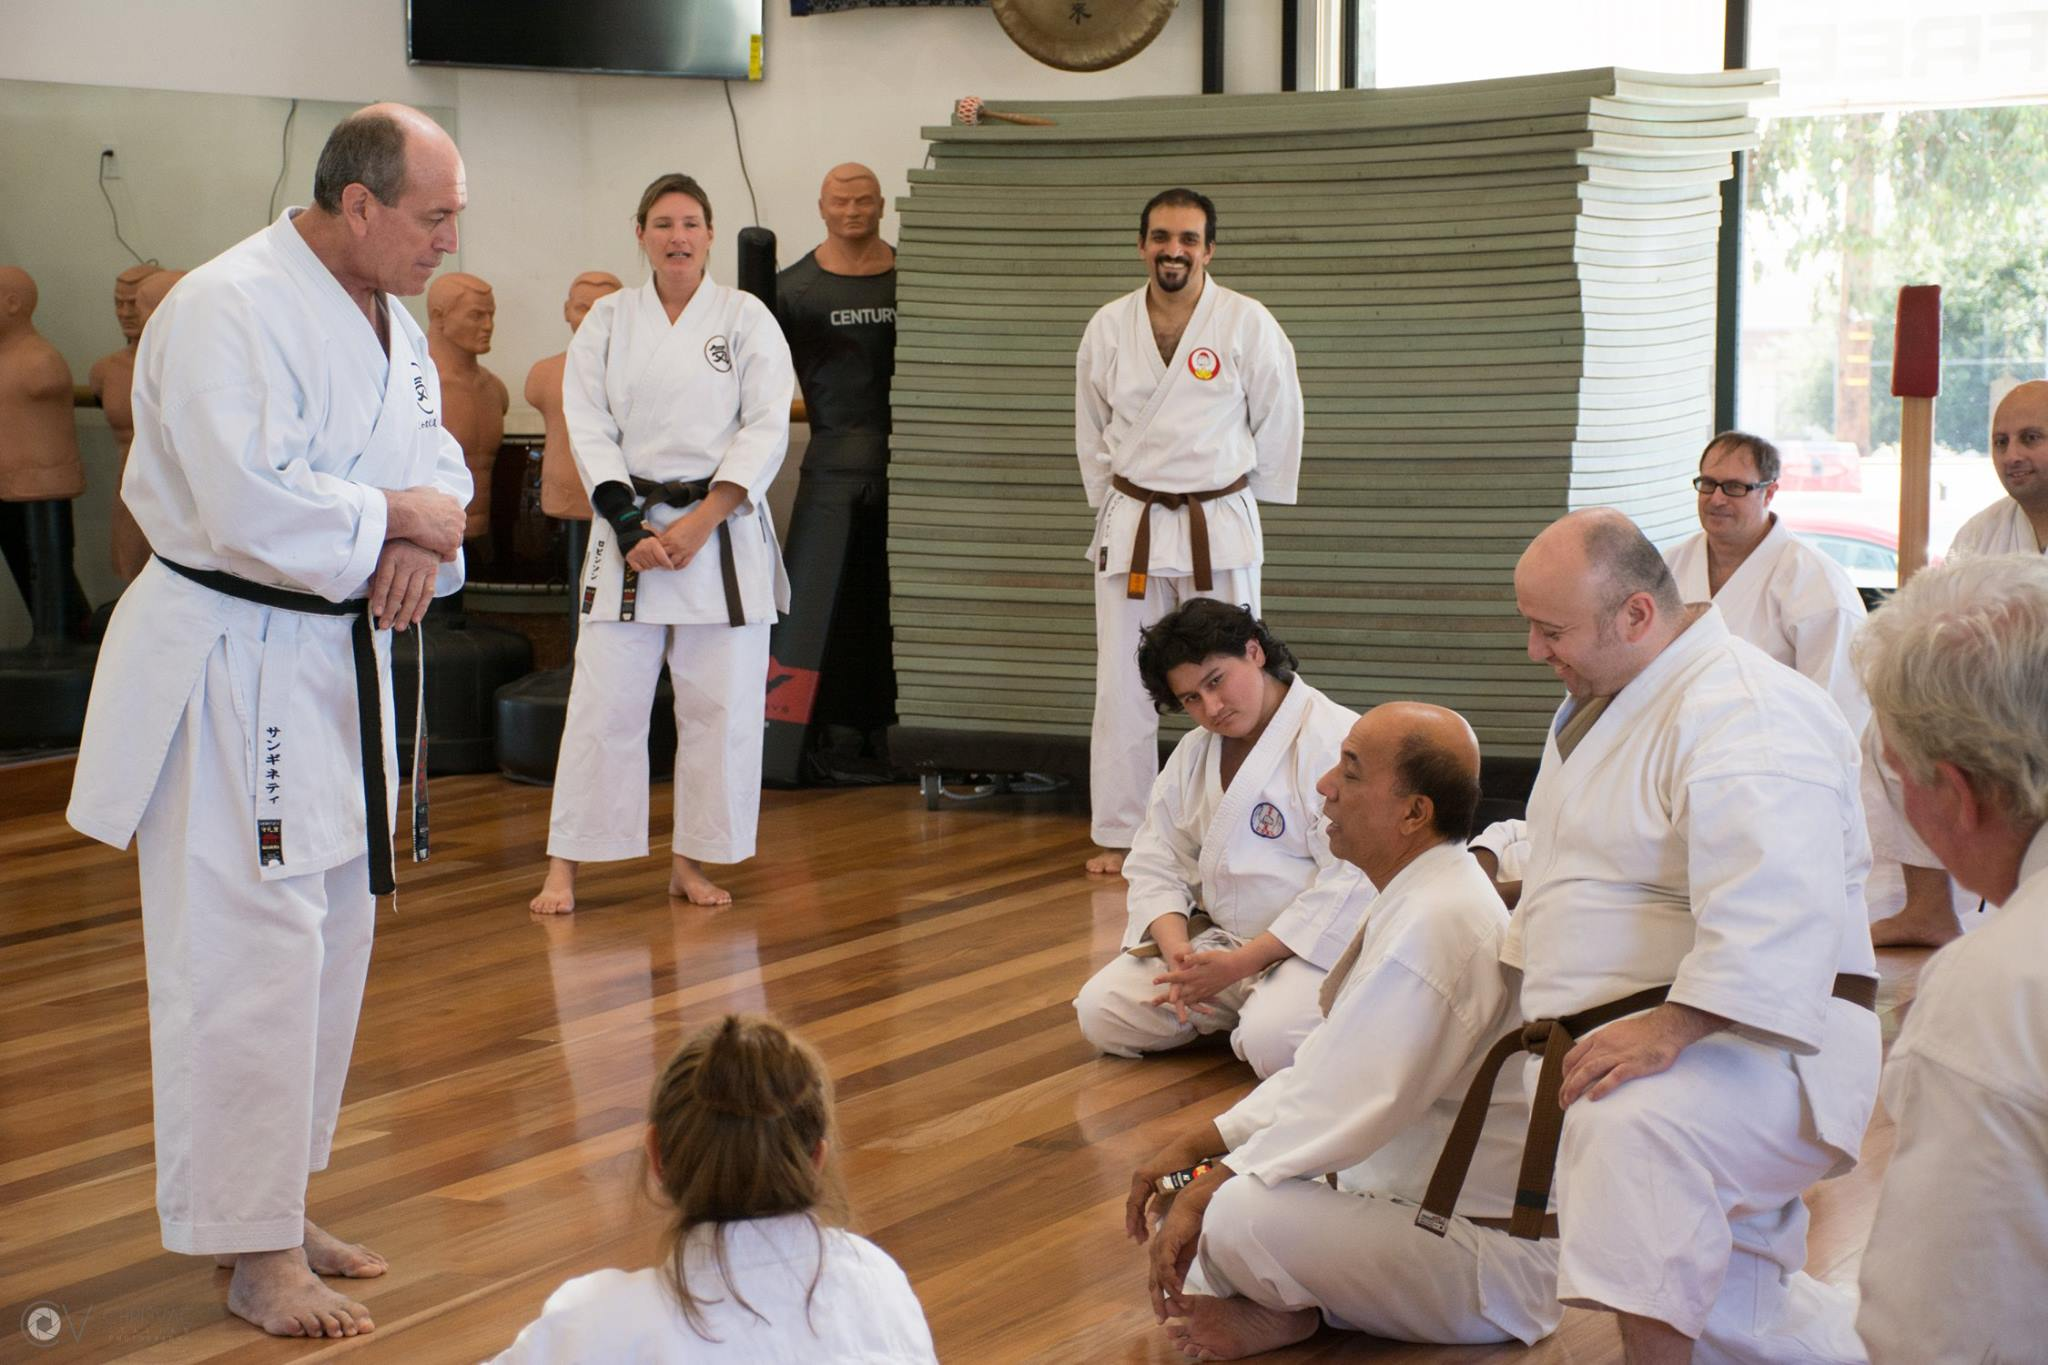 Sanchin seminar picture 4.jpg